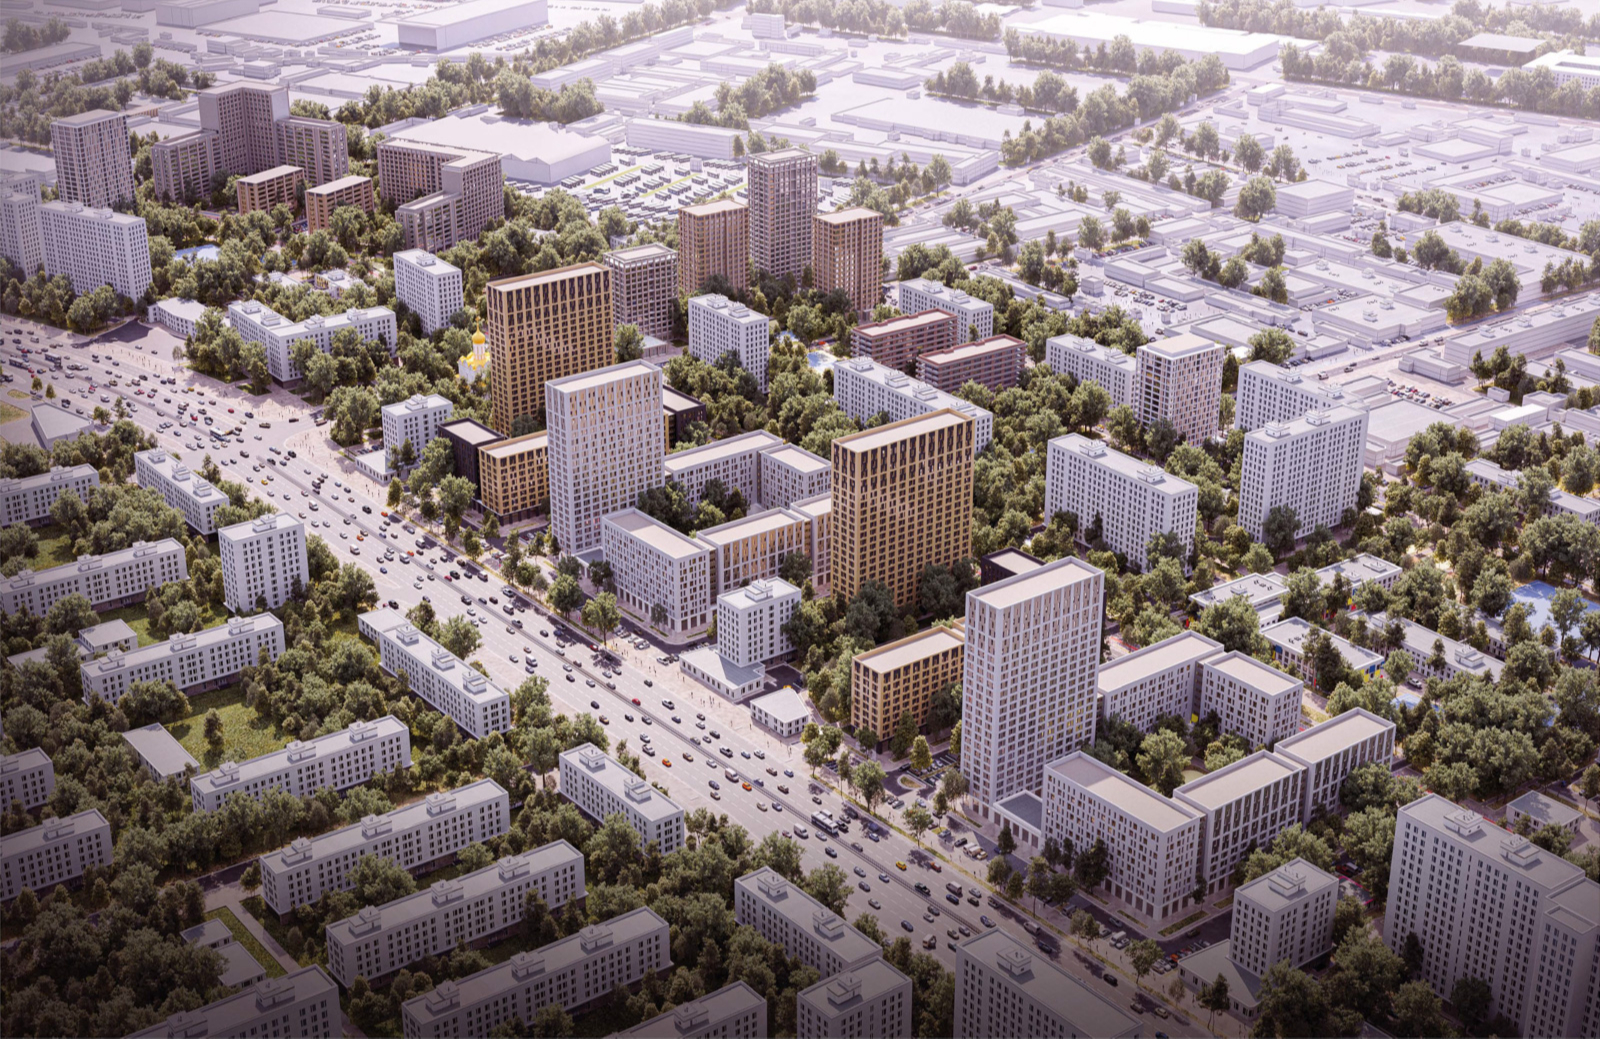 Визуализация «Хайлайт Архитектура» + Petitdidierprioux Architects via Институт Генплана Москвы